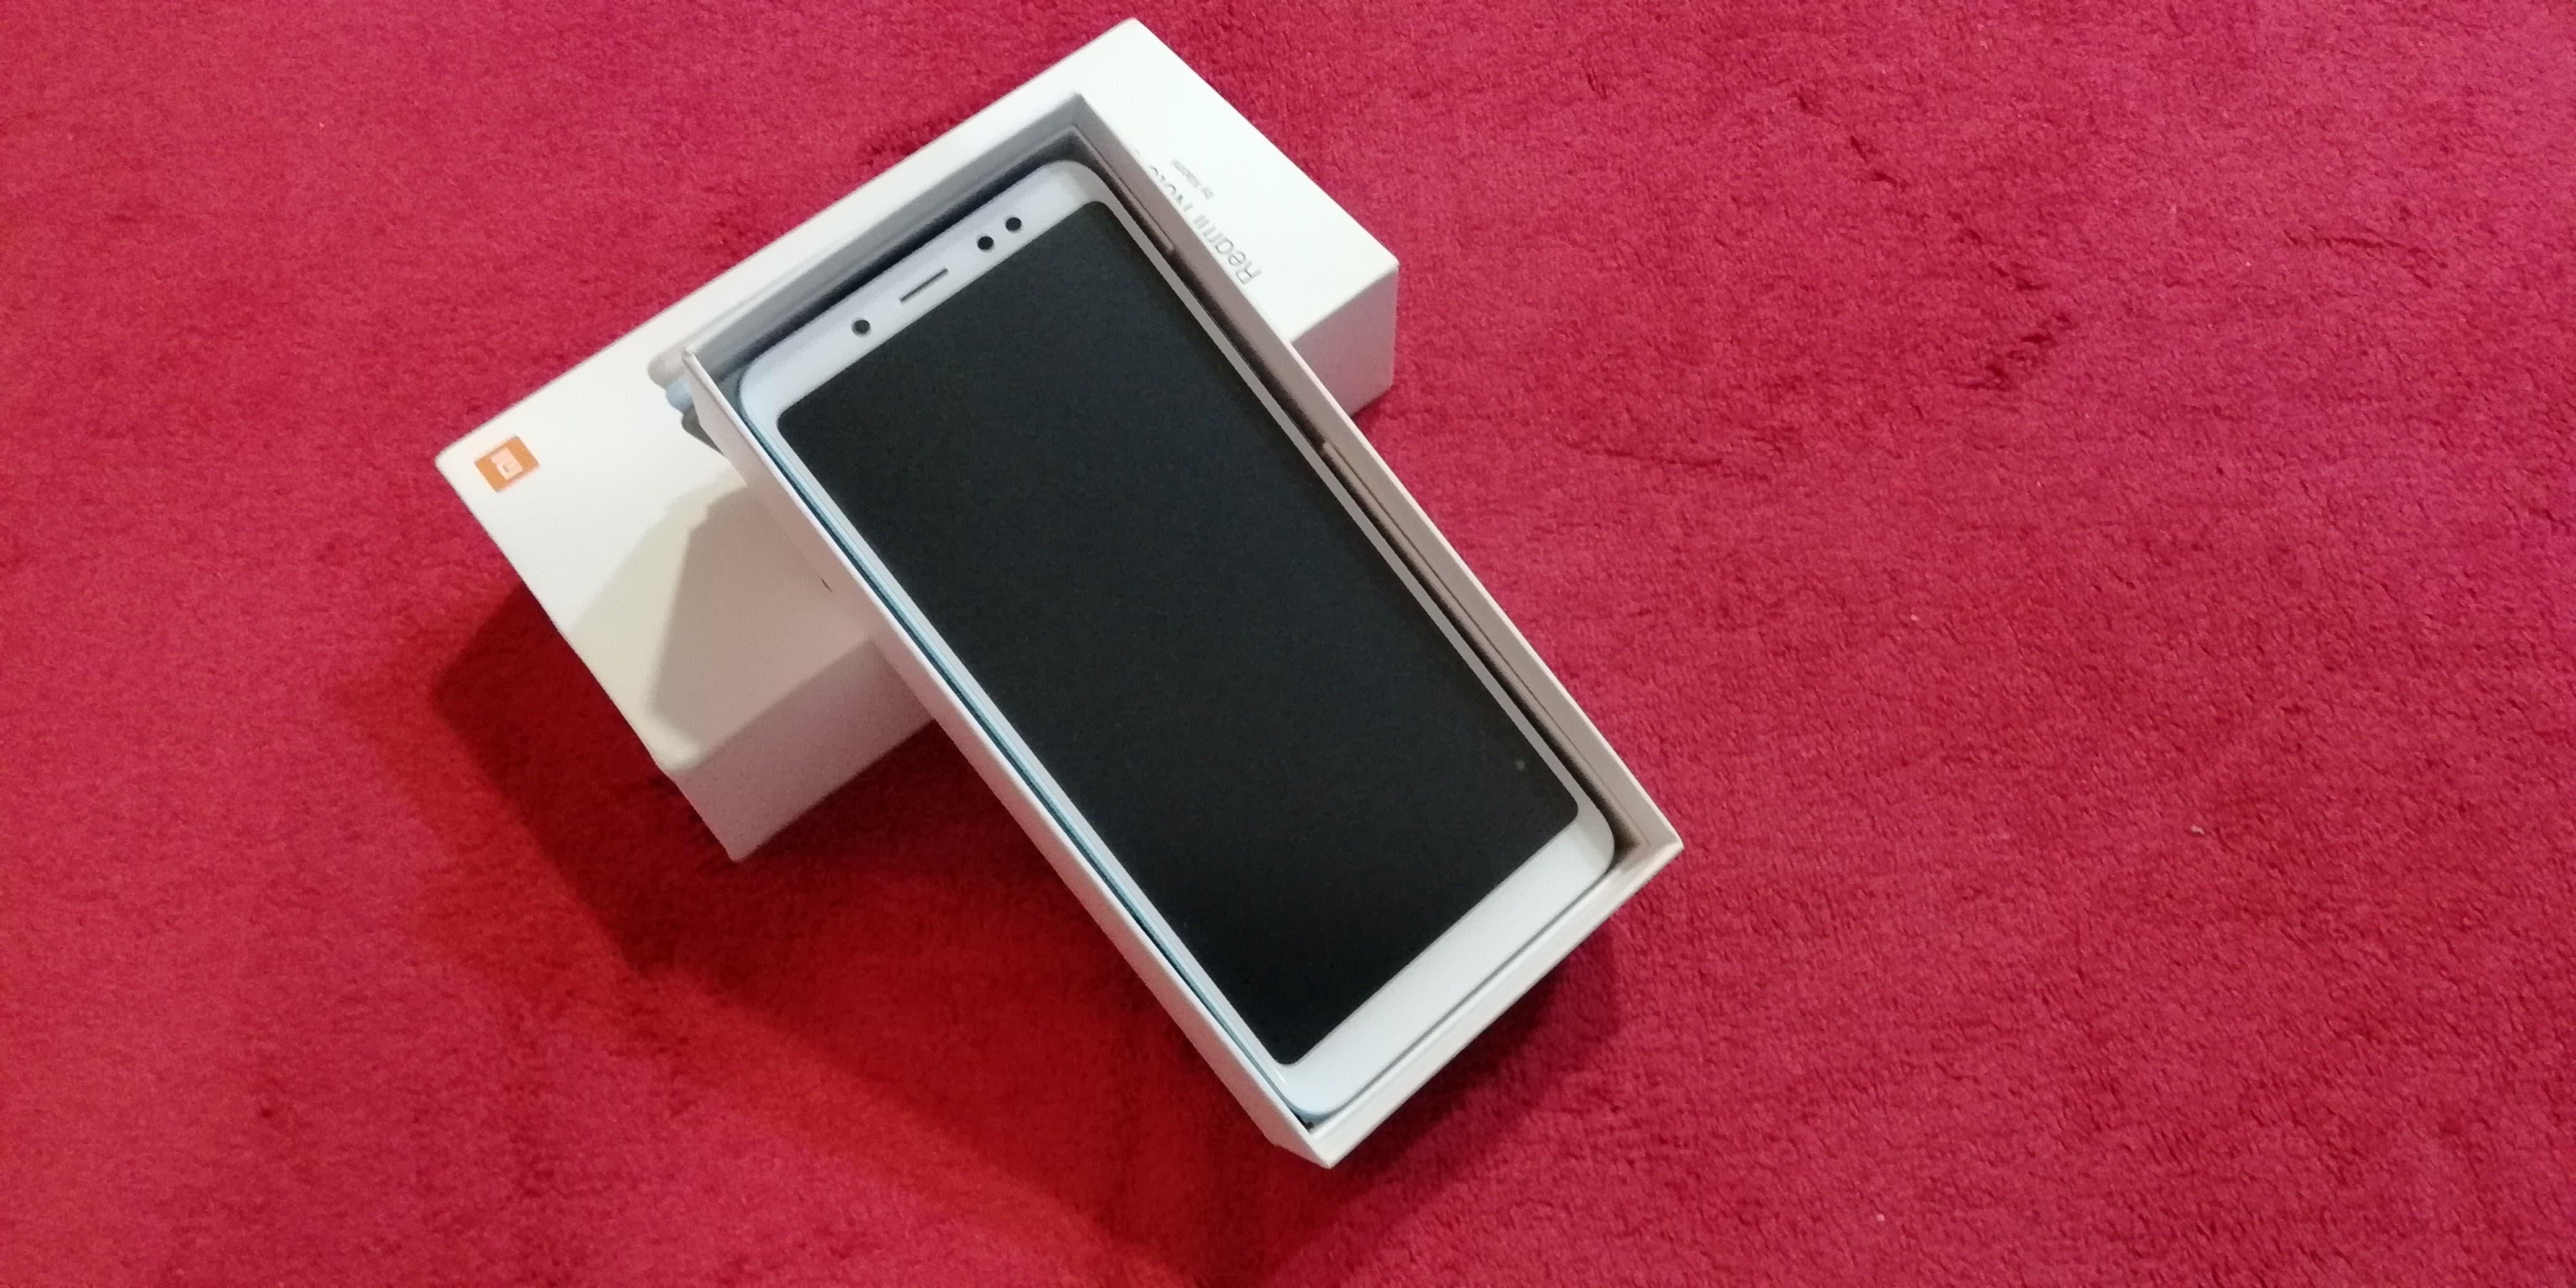 Redmi Note 5 Pro: Unboxing